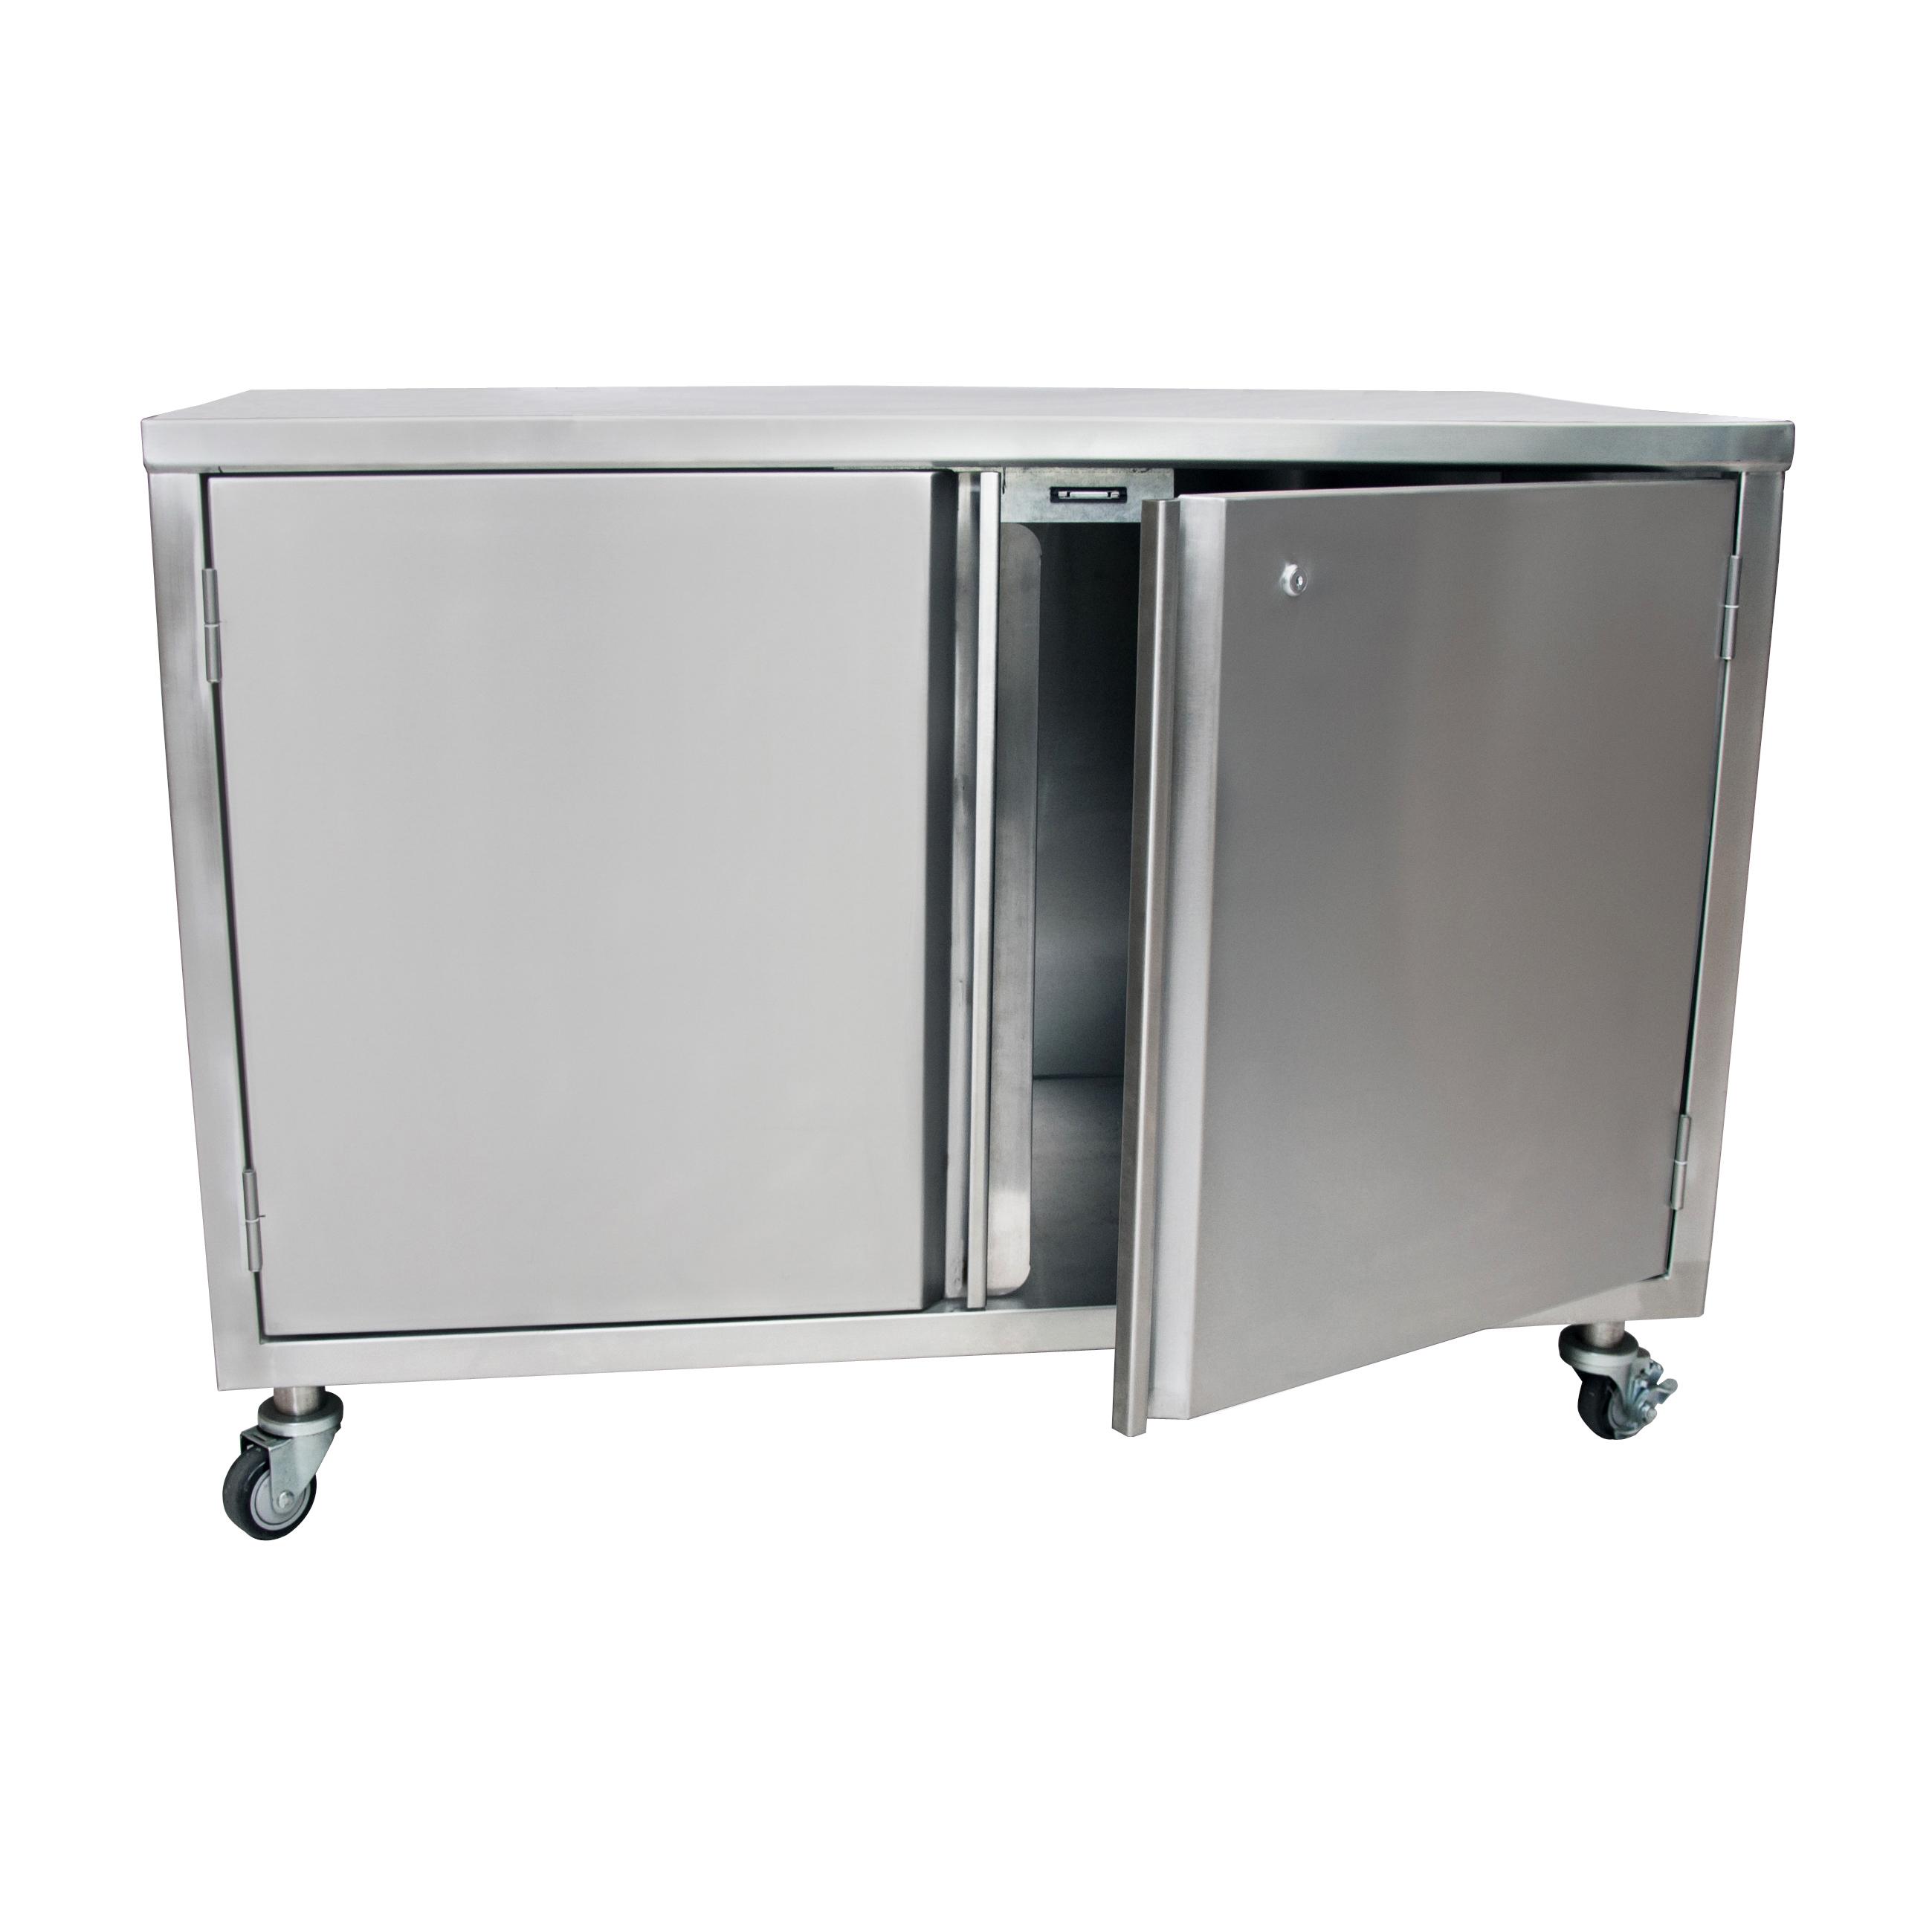 BK Resources BKDC-3648HL work table, cabinet base hinged doors